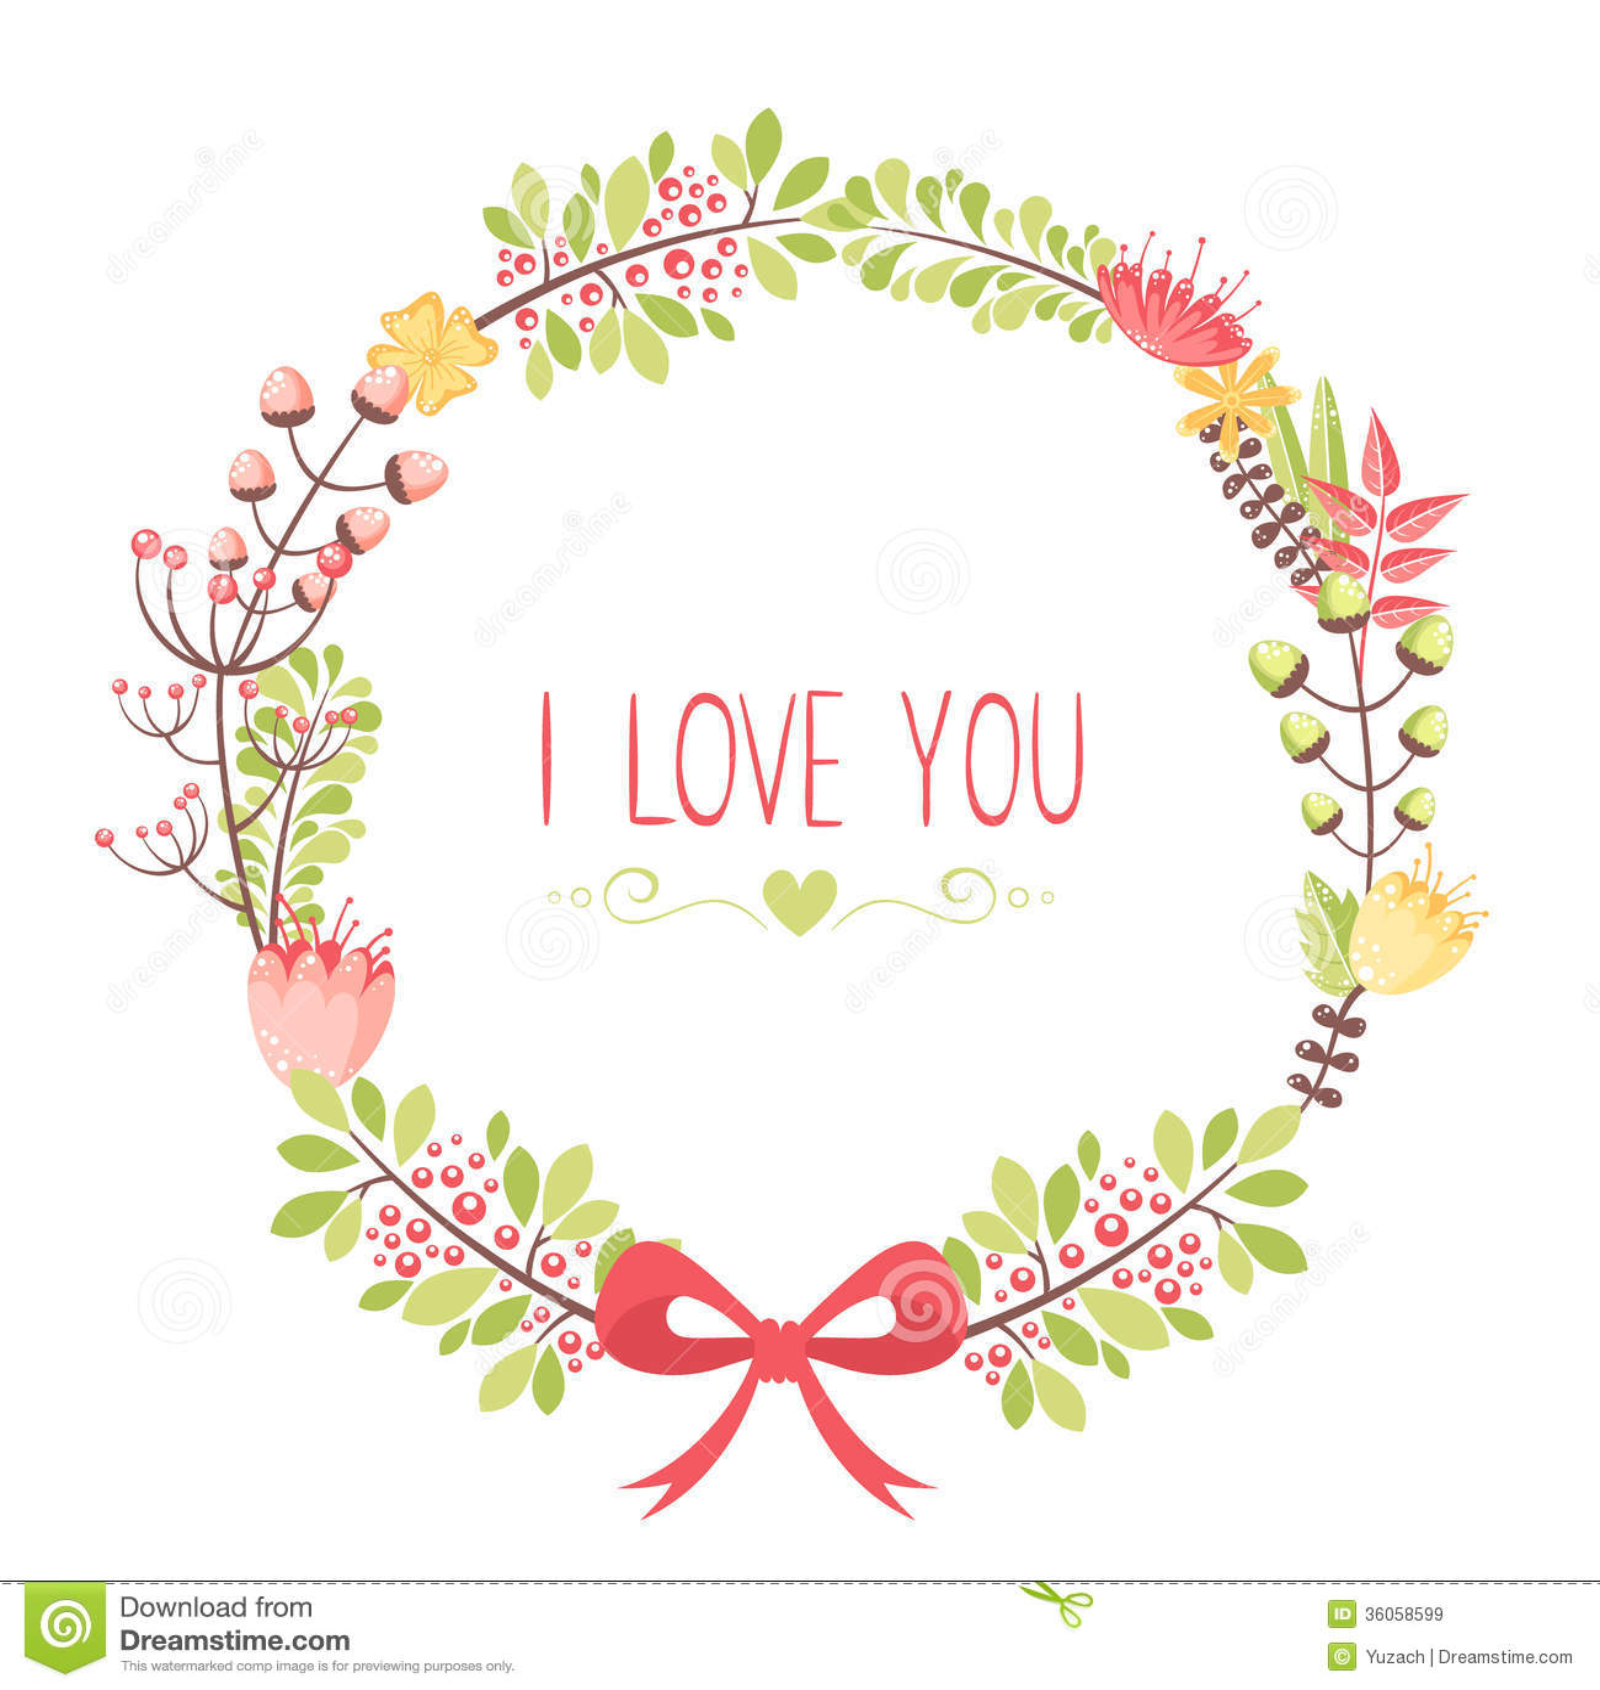 Elegant Floral Congratulation Card  Free Congratulation Cards